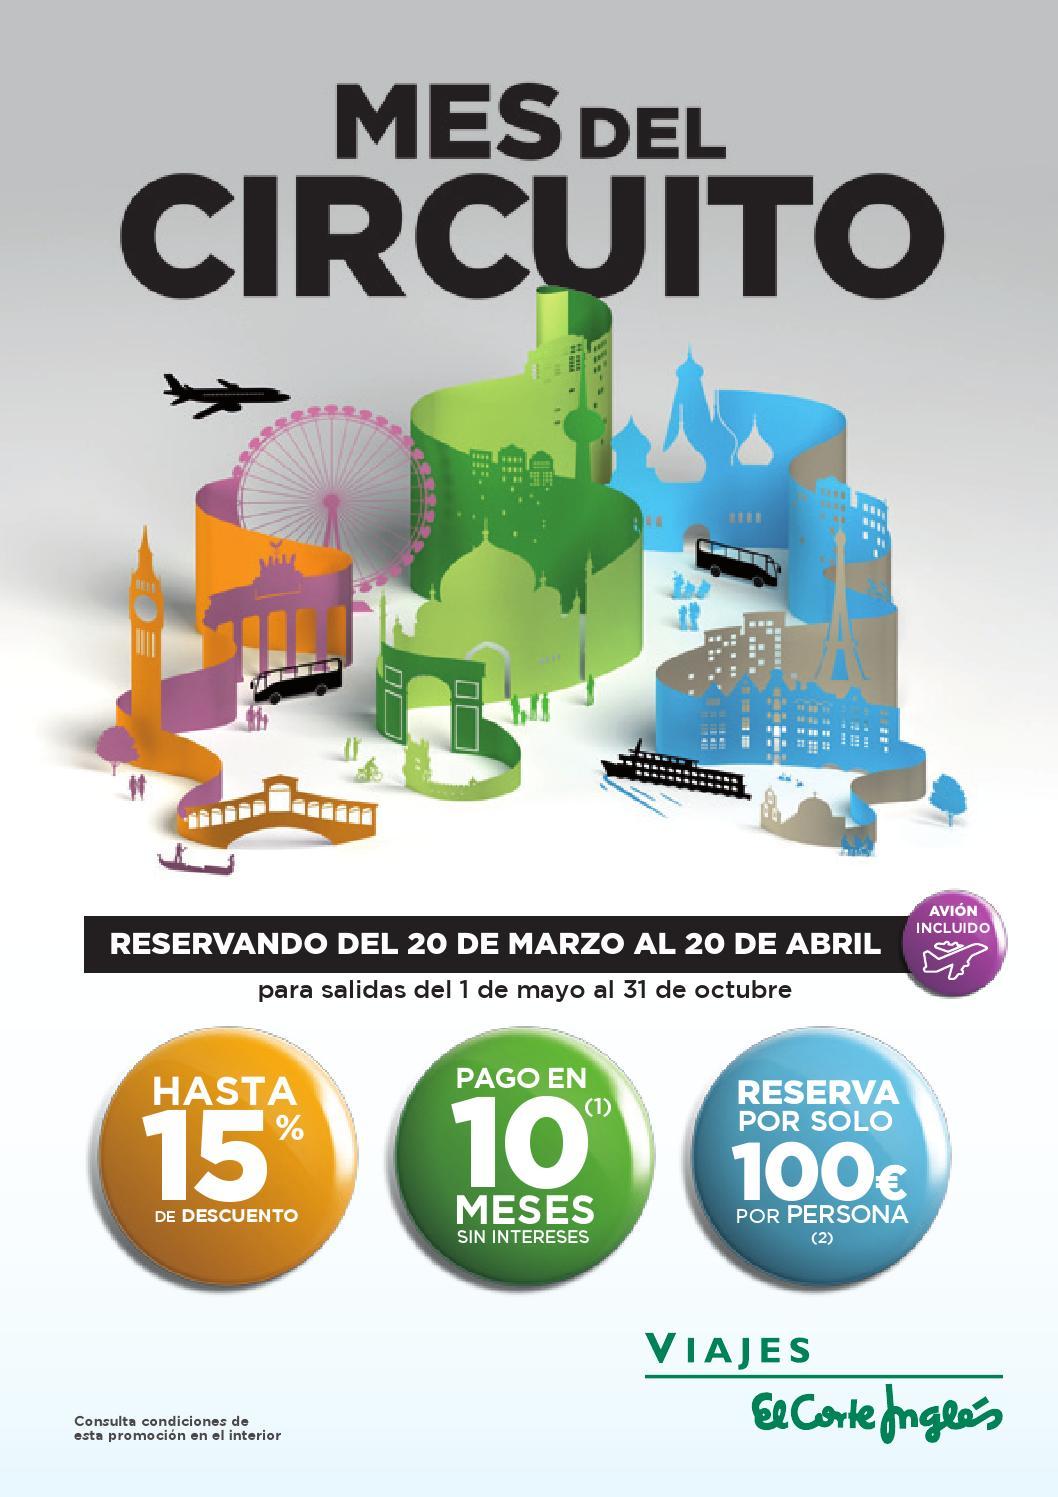 Viajes El Corte Inglés Mes Del Circuito 2014 By André Gonçalves Issuu